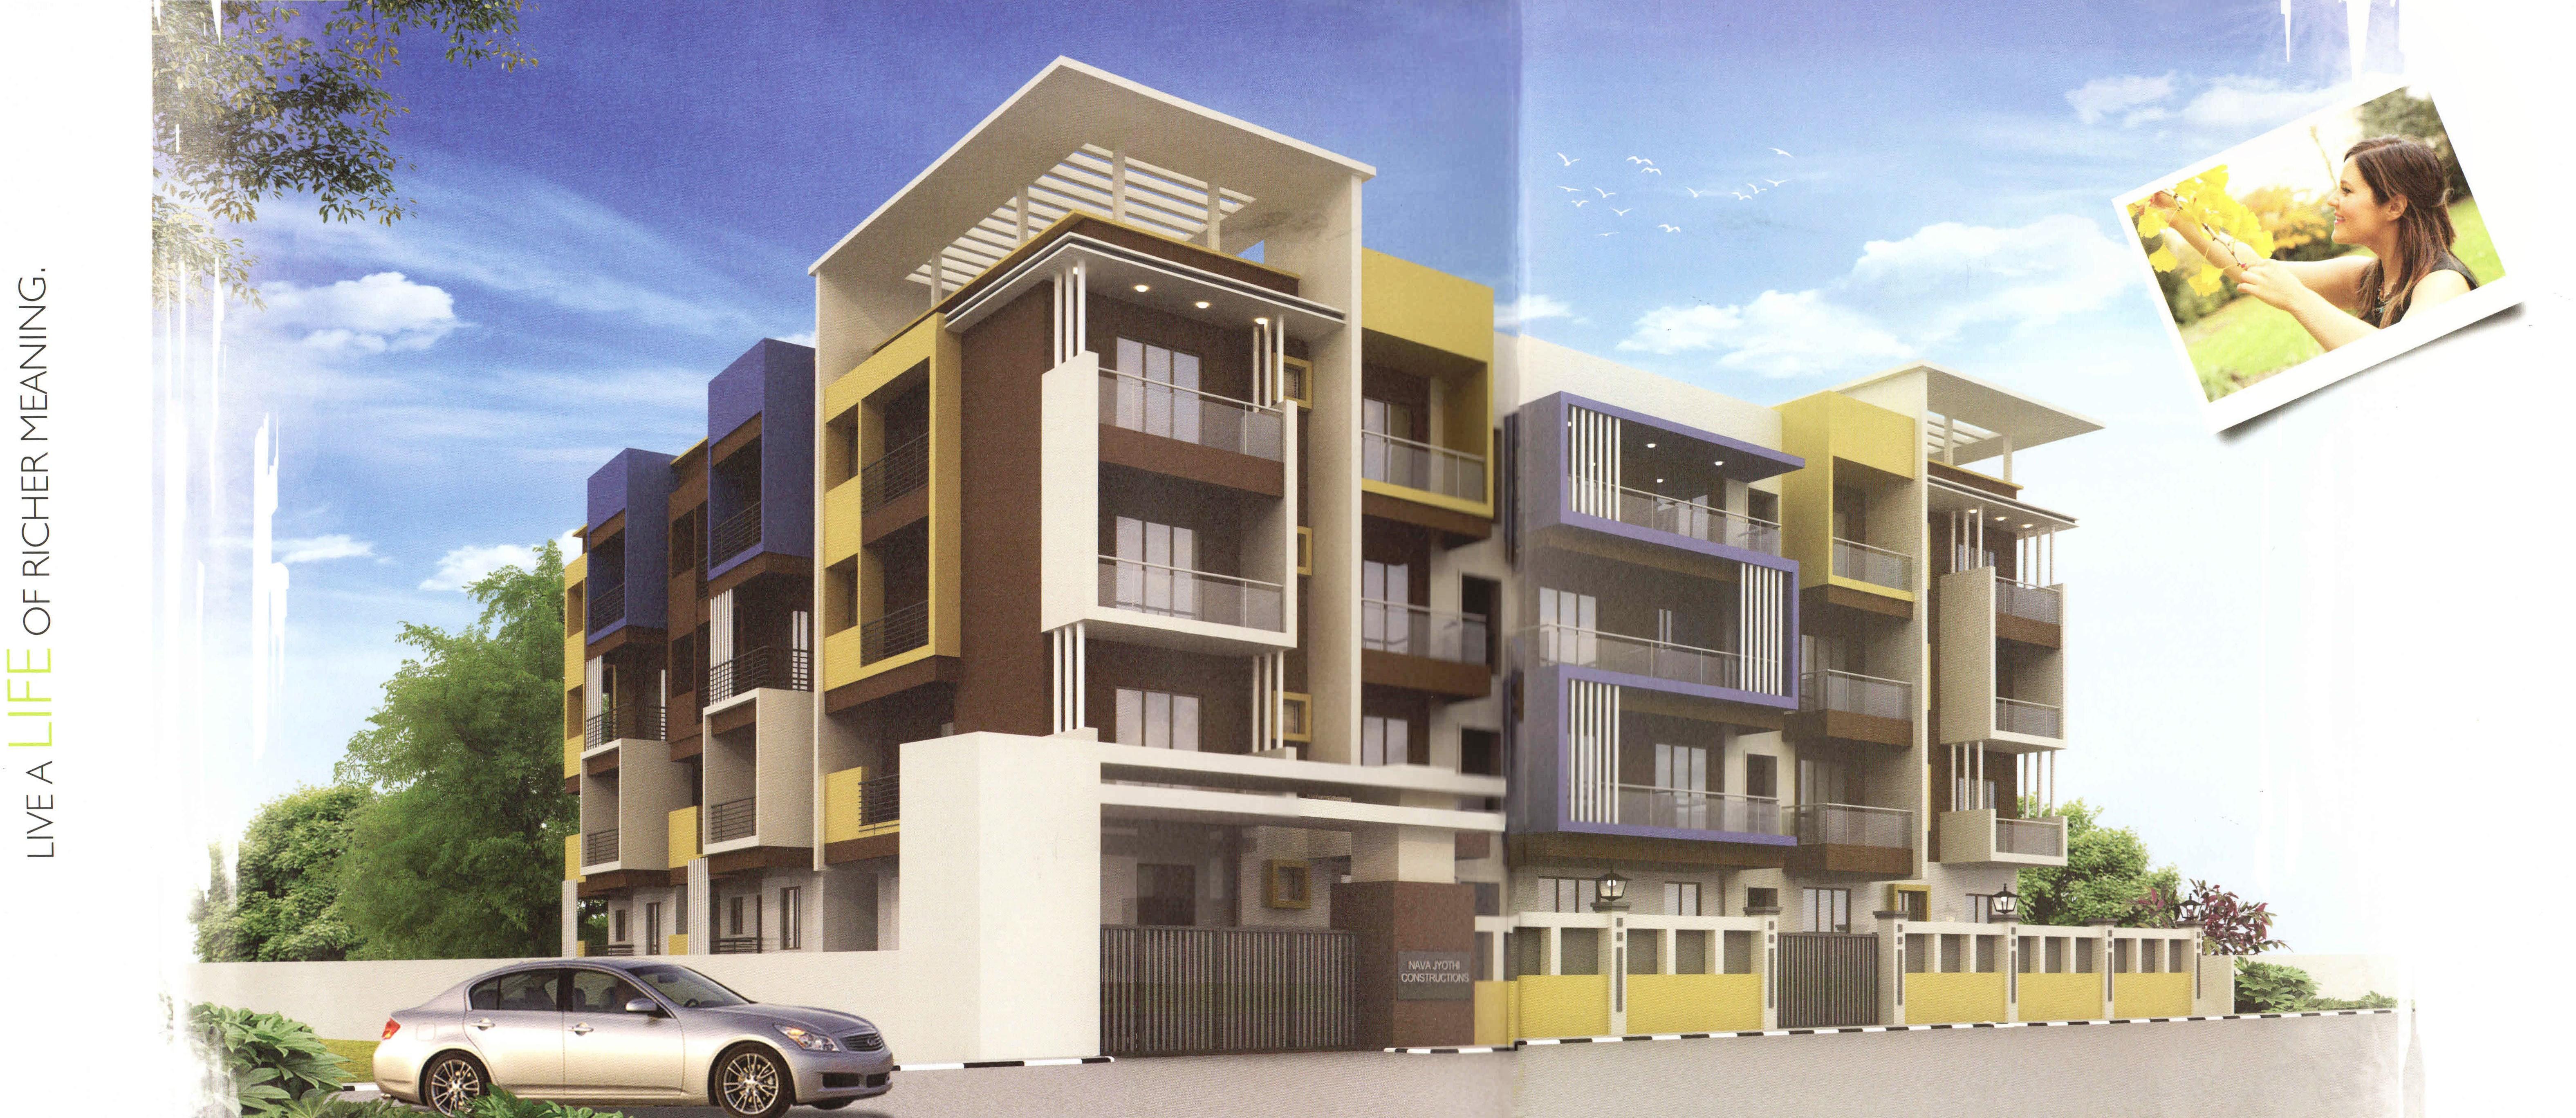 2 BHK flats for sales in Doddanekkundi